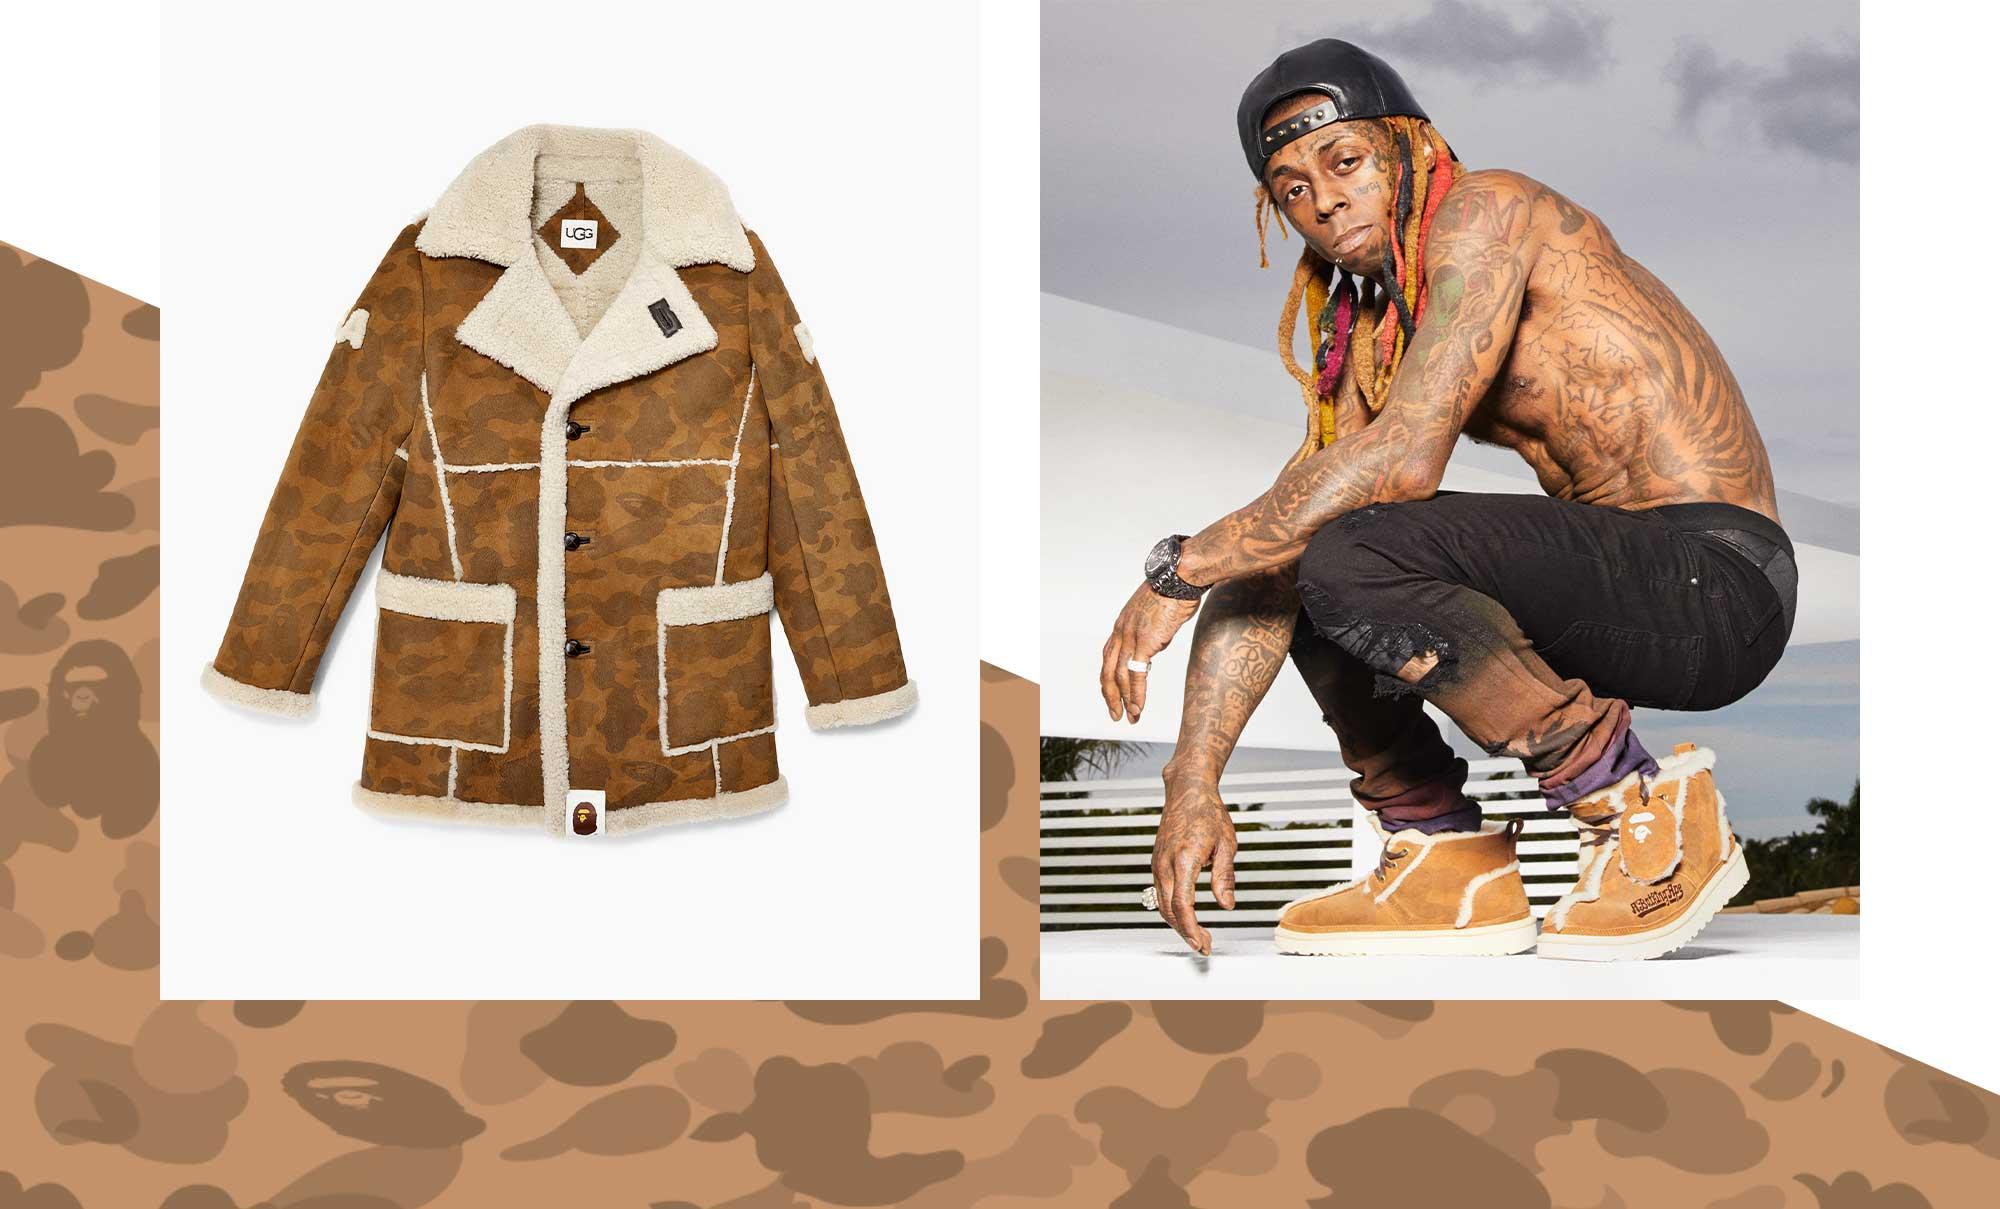 The Bape-UGG Jacket, and Lil Wayne wearing Bapes